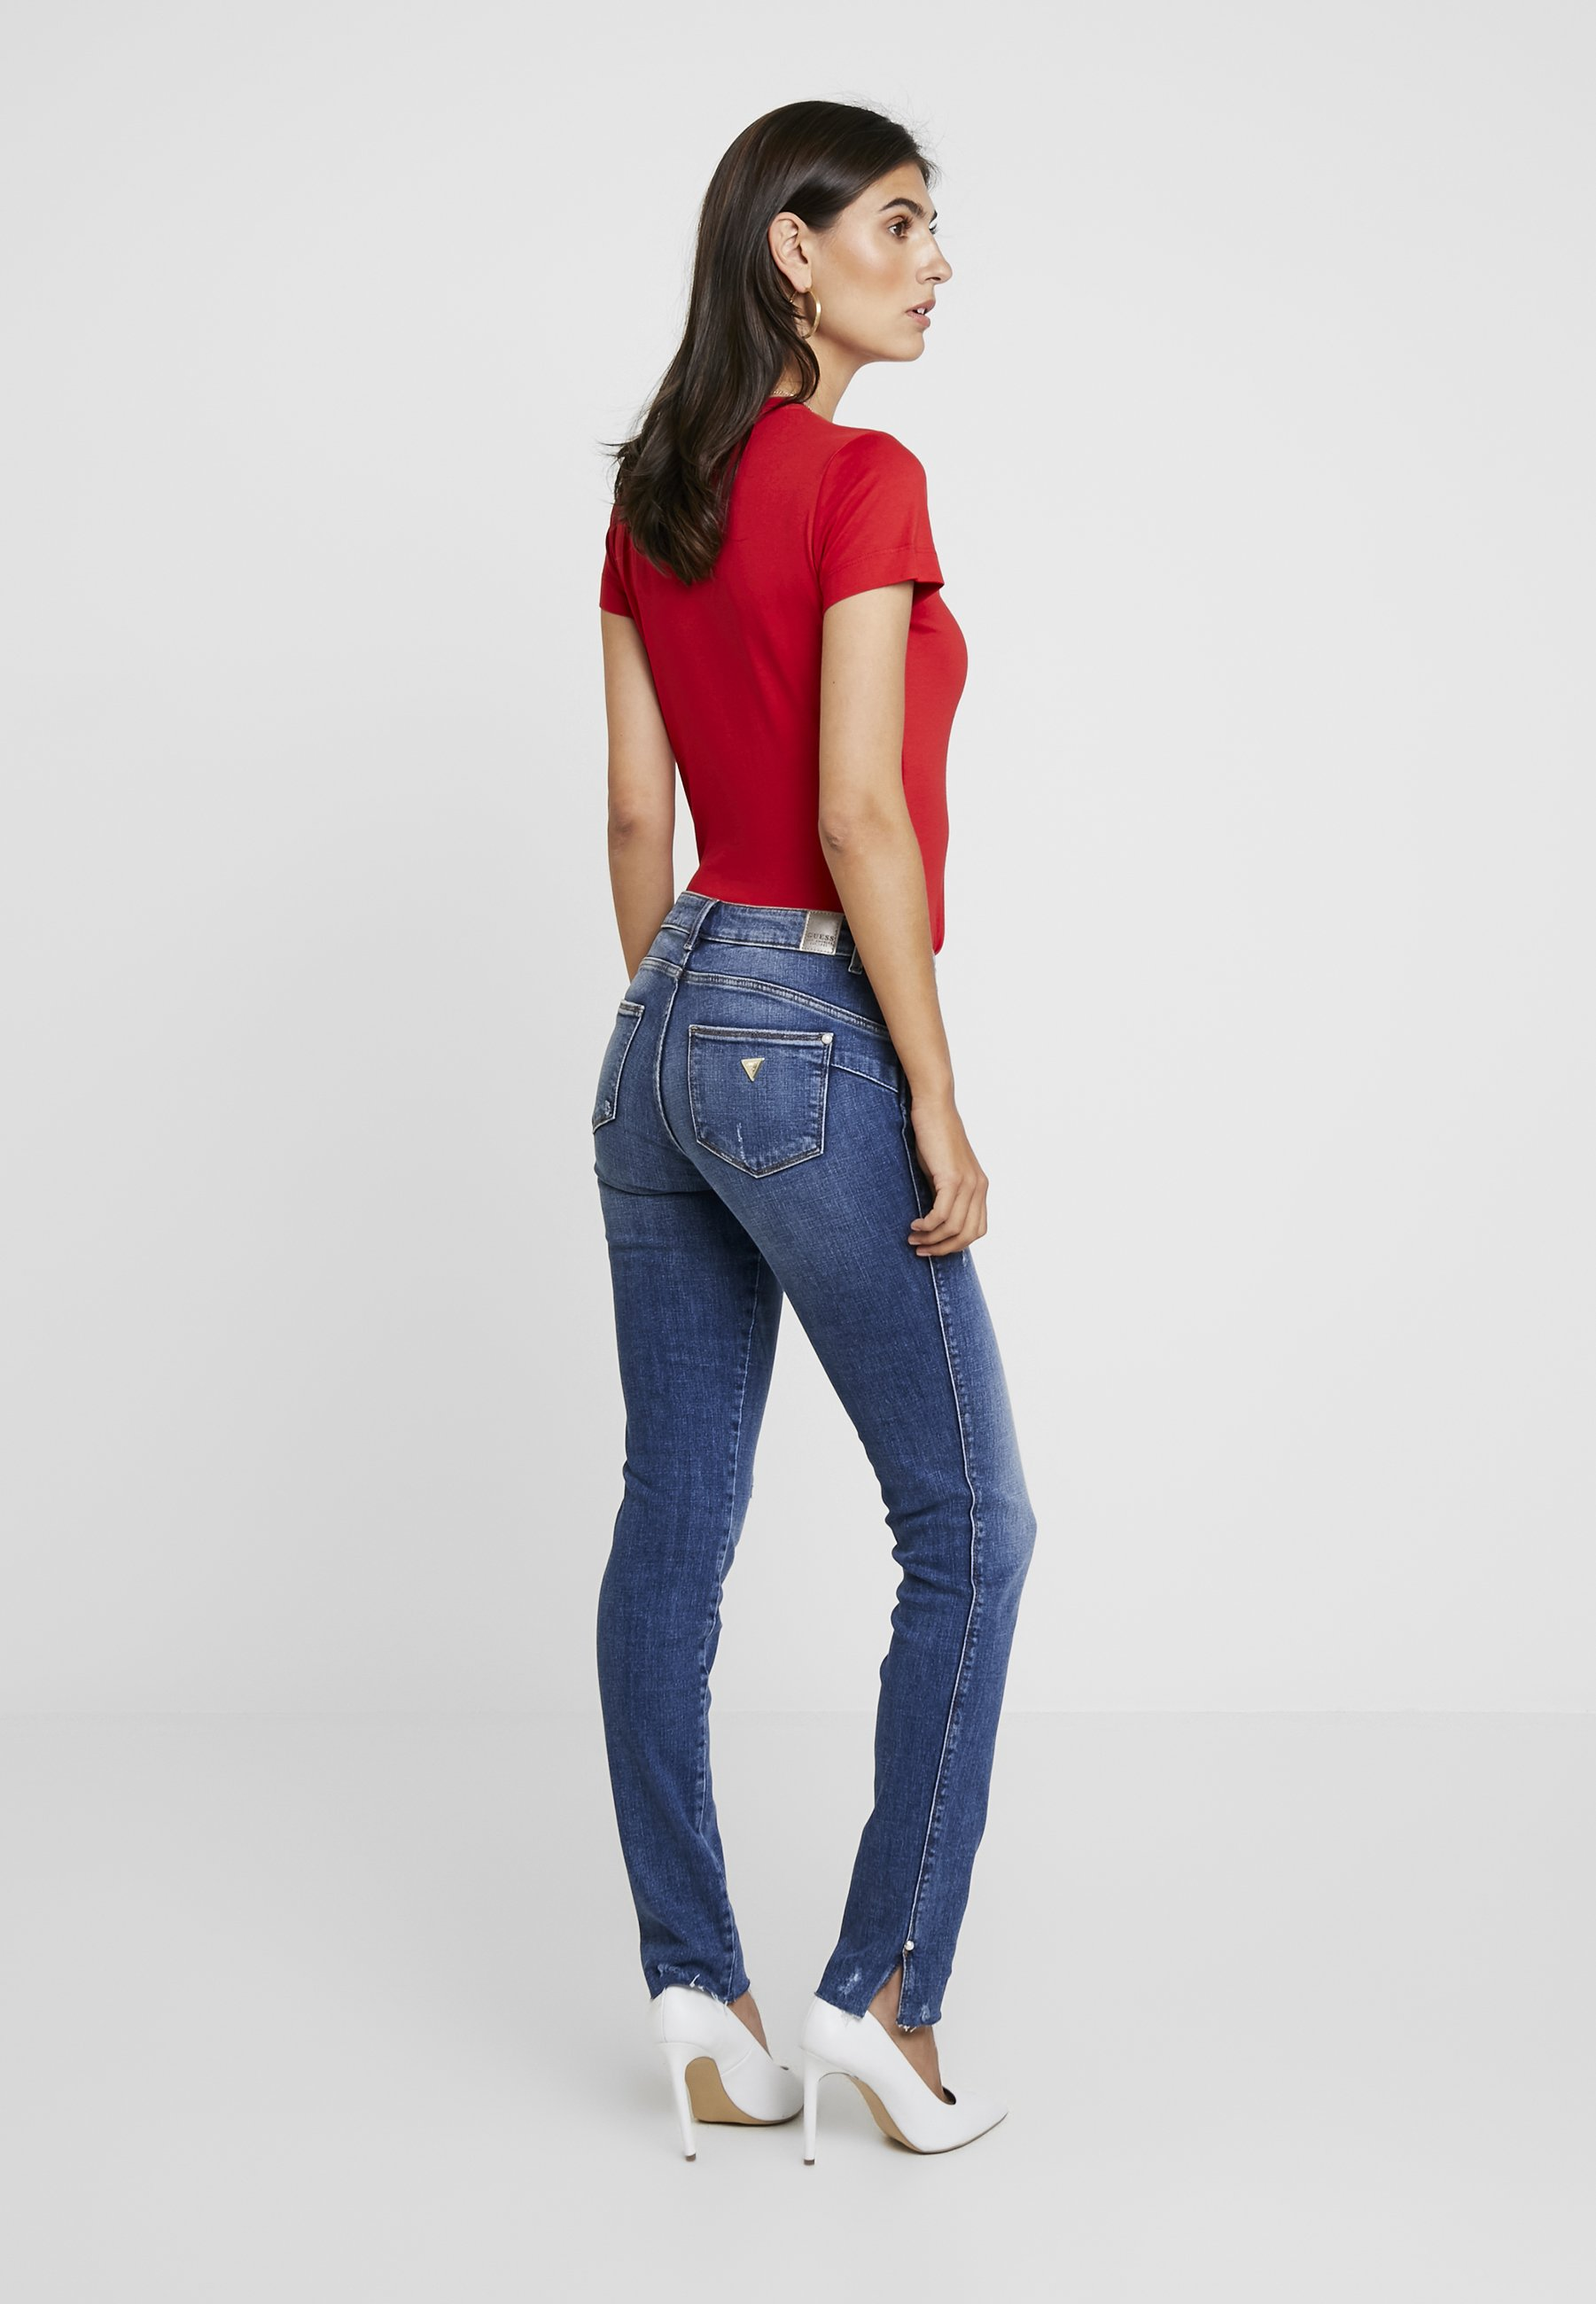 Guess SplitJeans Ultra Richness Curve Skinny CxWordBe